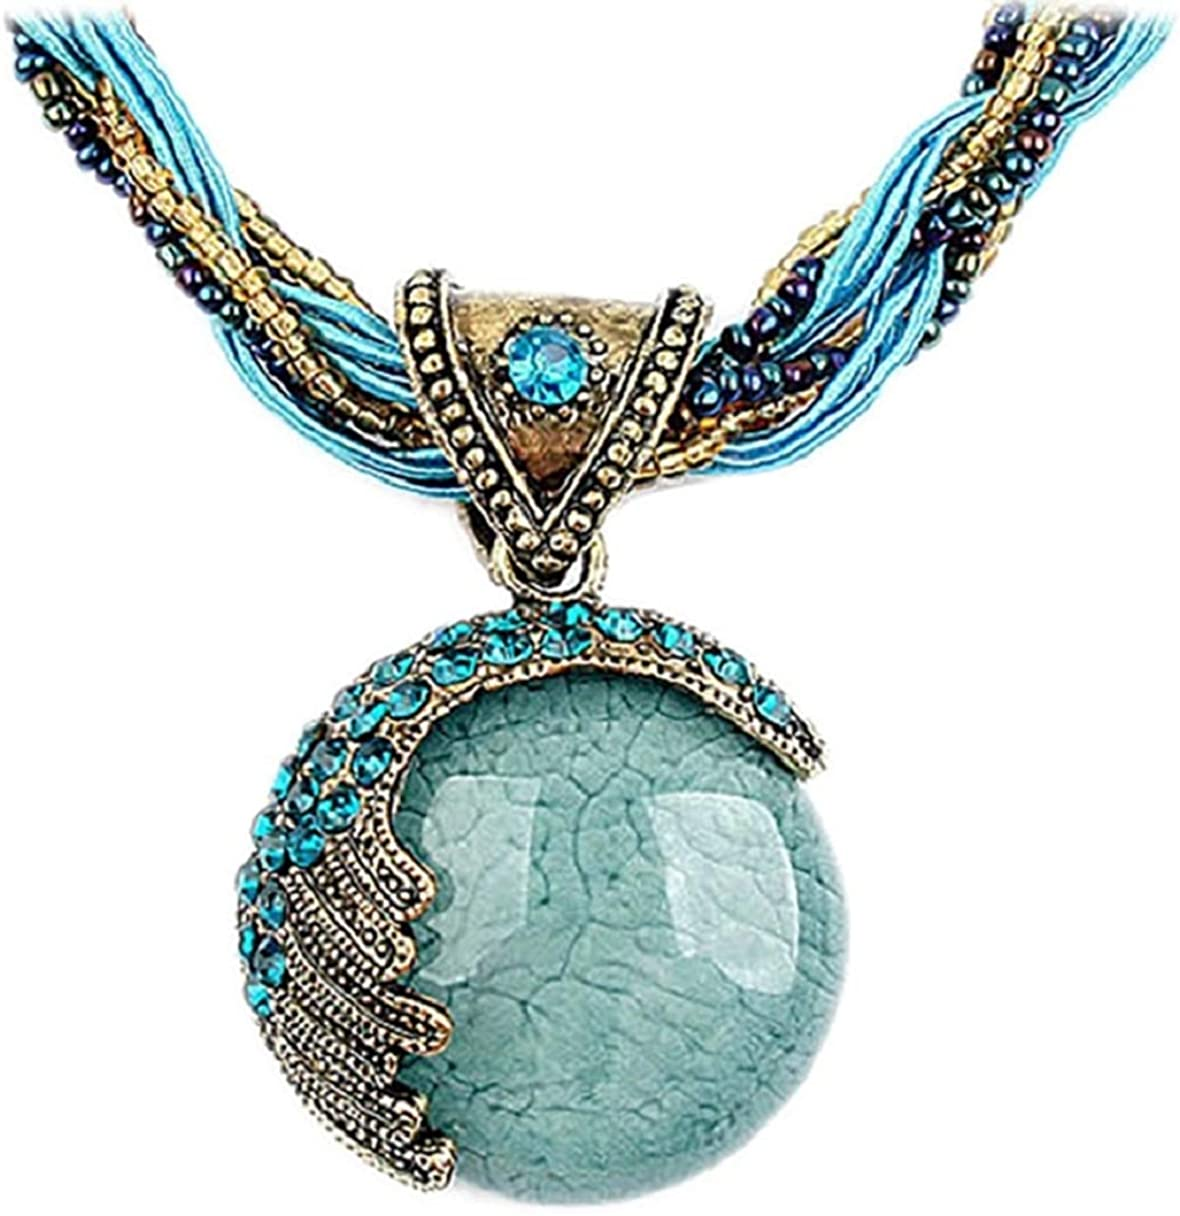 Jeolory Women Lady Gir's Retro Vintage Bohemian Statement Beaded Chain Rhinestone Pendent Collar Necklace